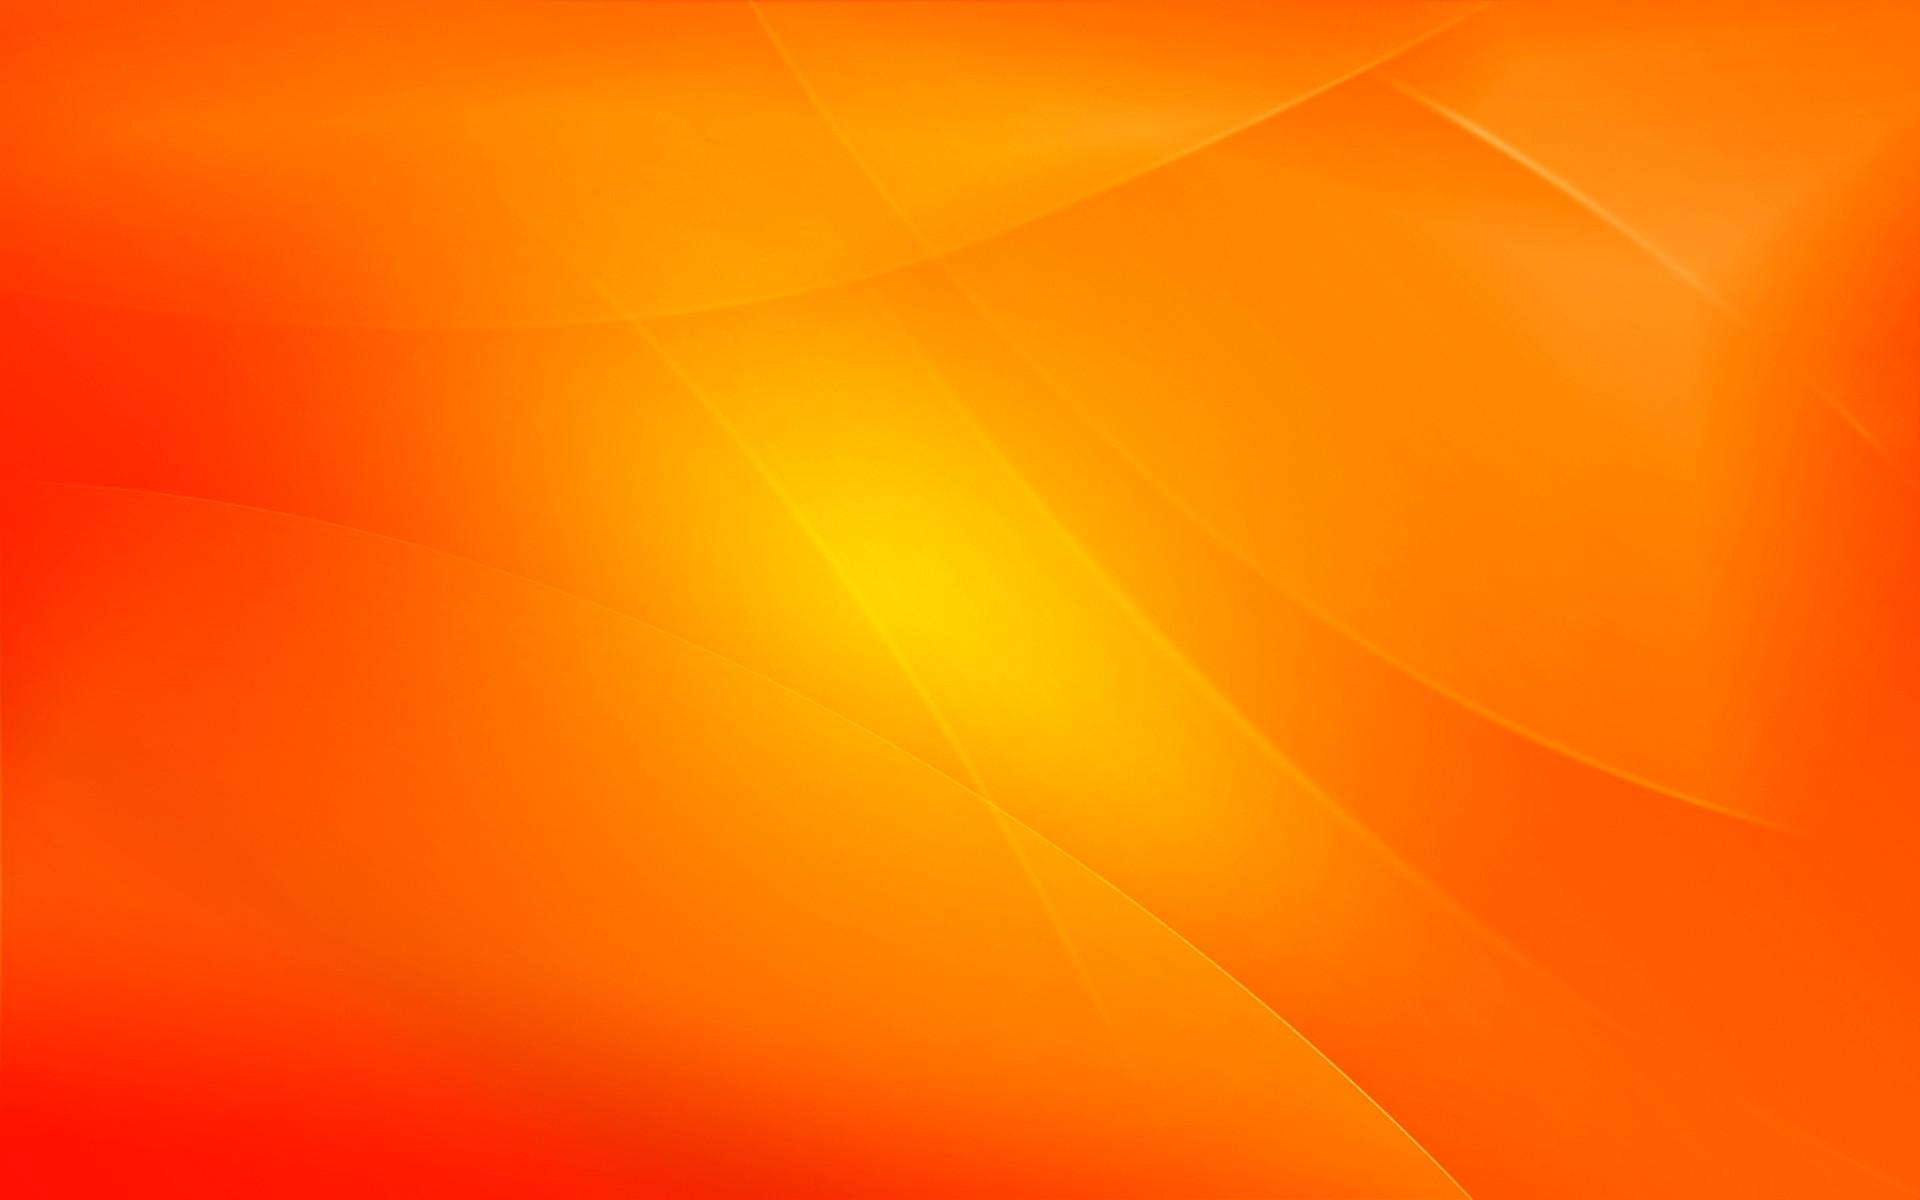 Super Orange Wallpaper